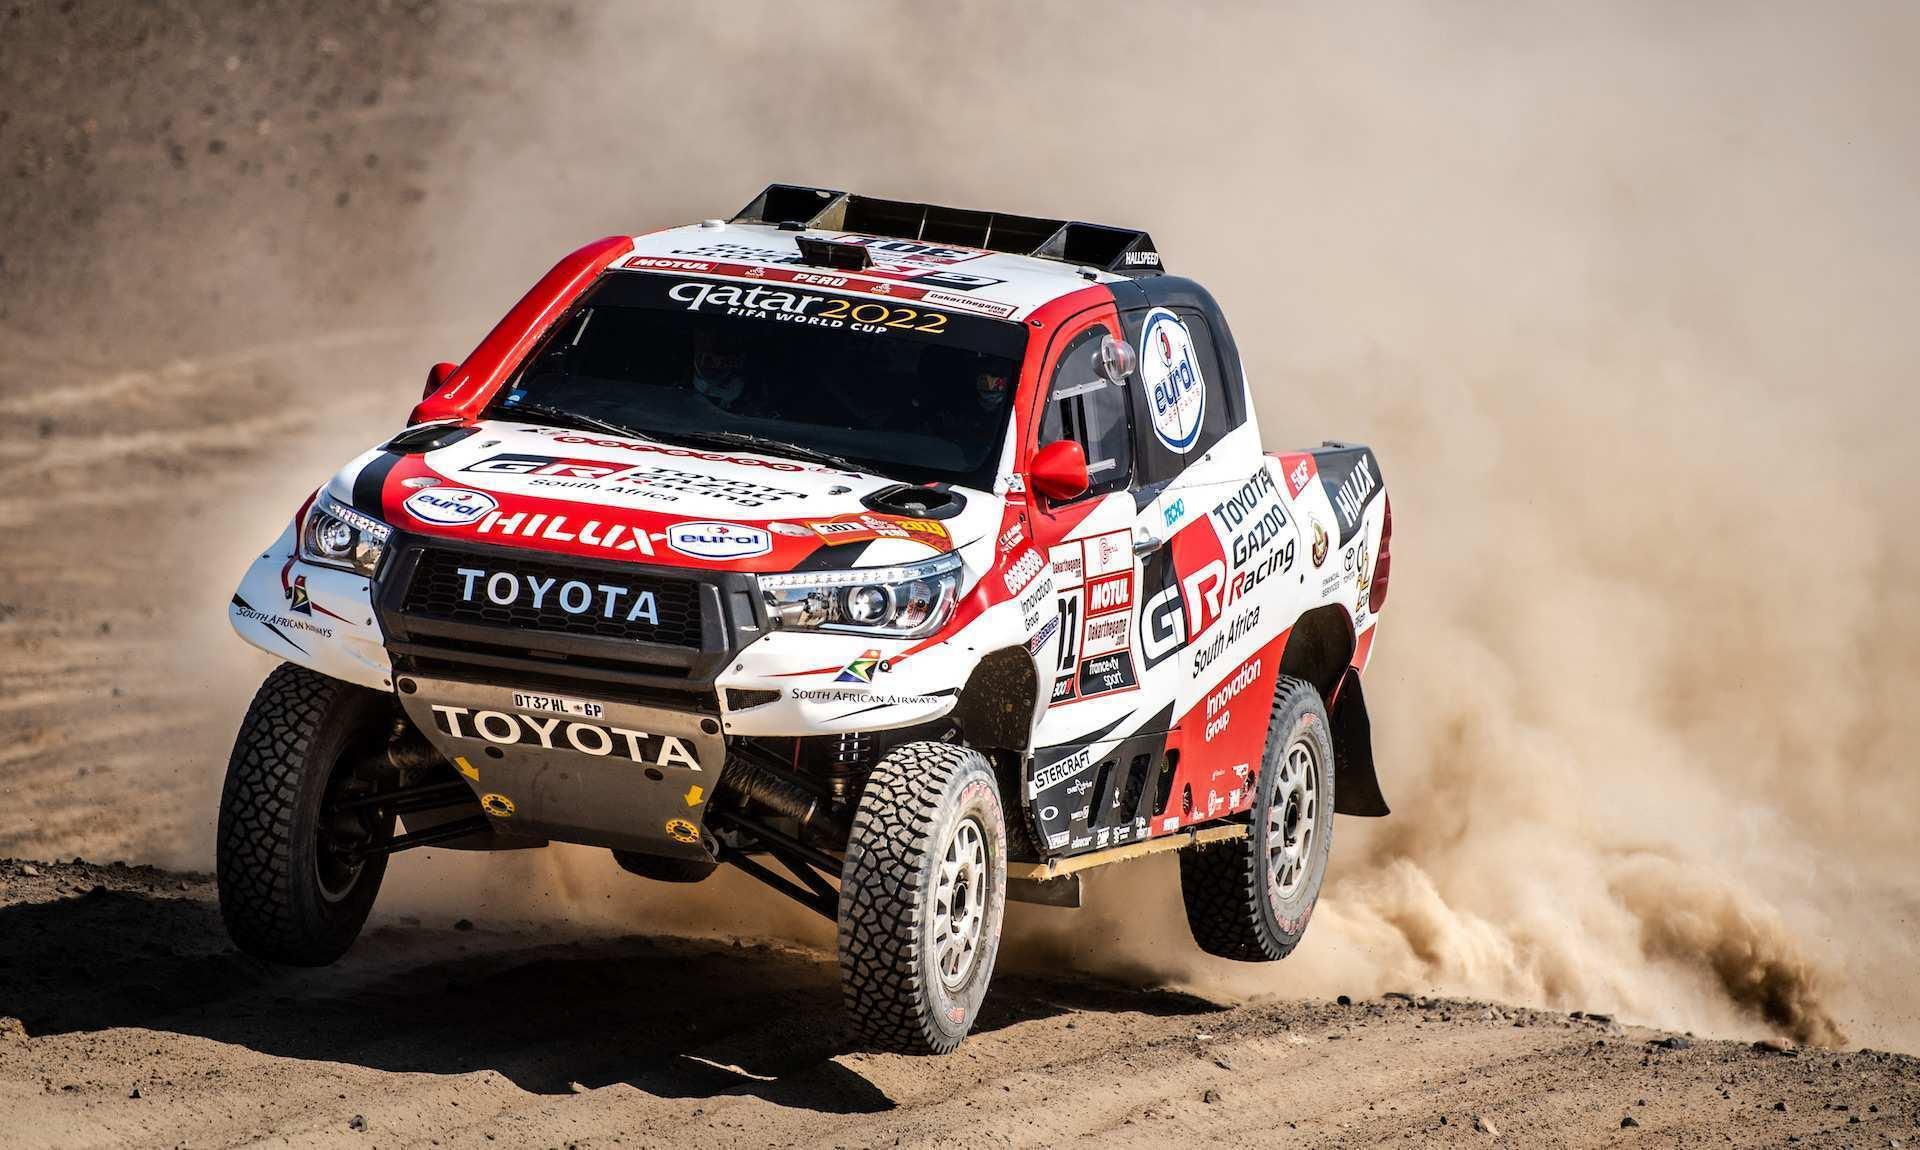 60 The 2019 Toyota Dakar Exterior and Interior with 2019 Toyota Dakar